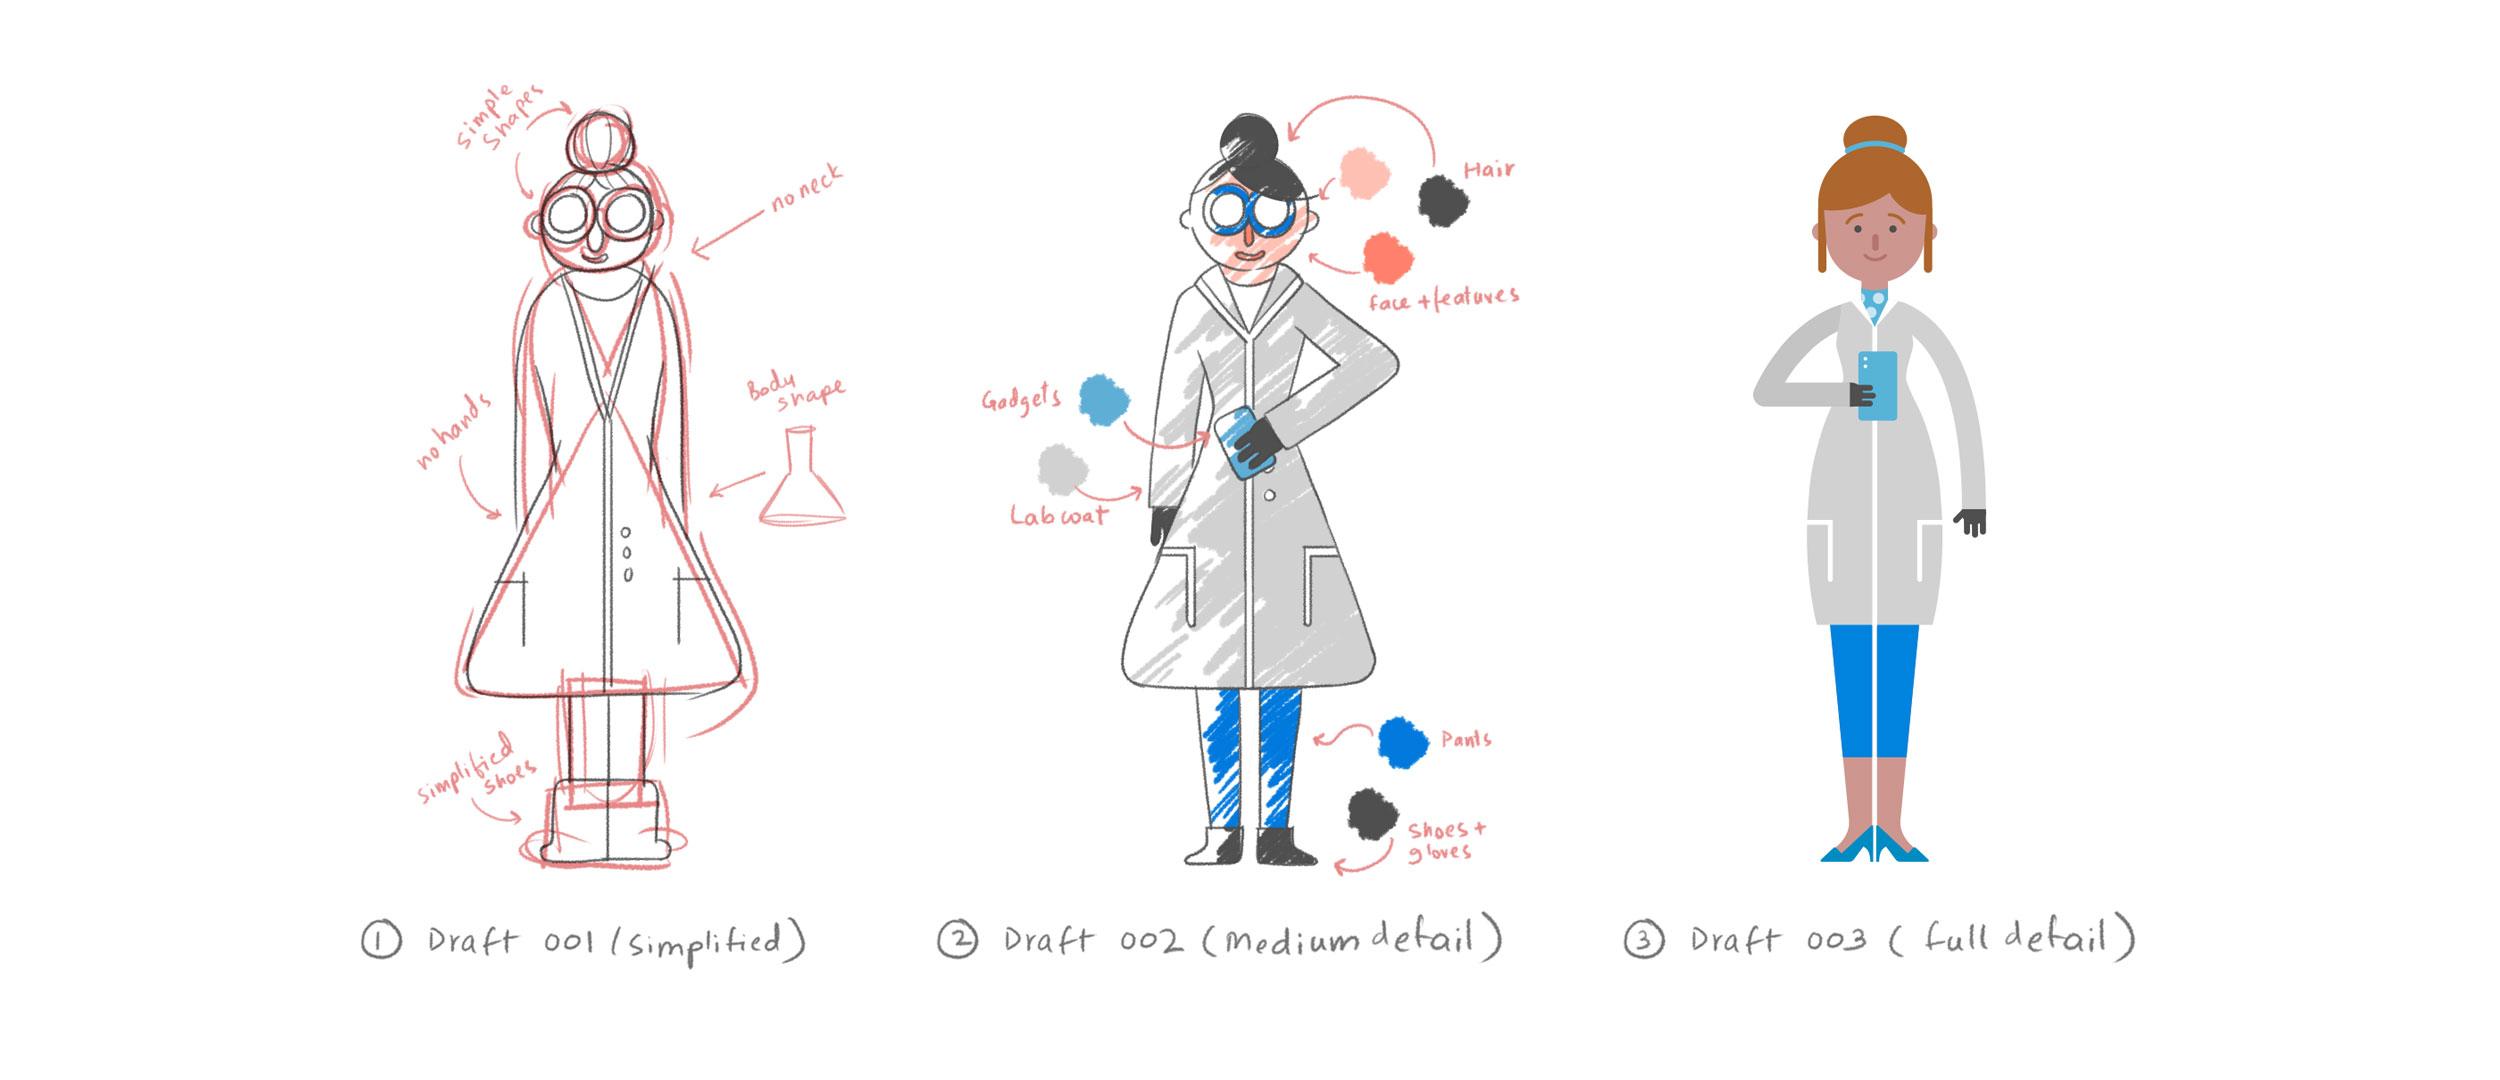 01_creating-the-art_characters (1).jpg